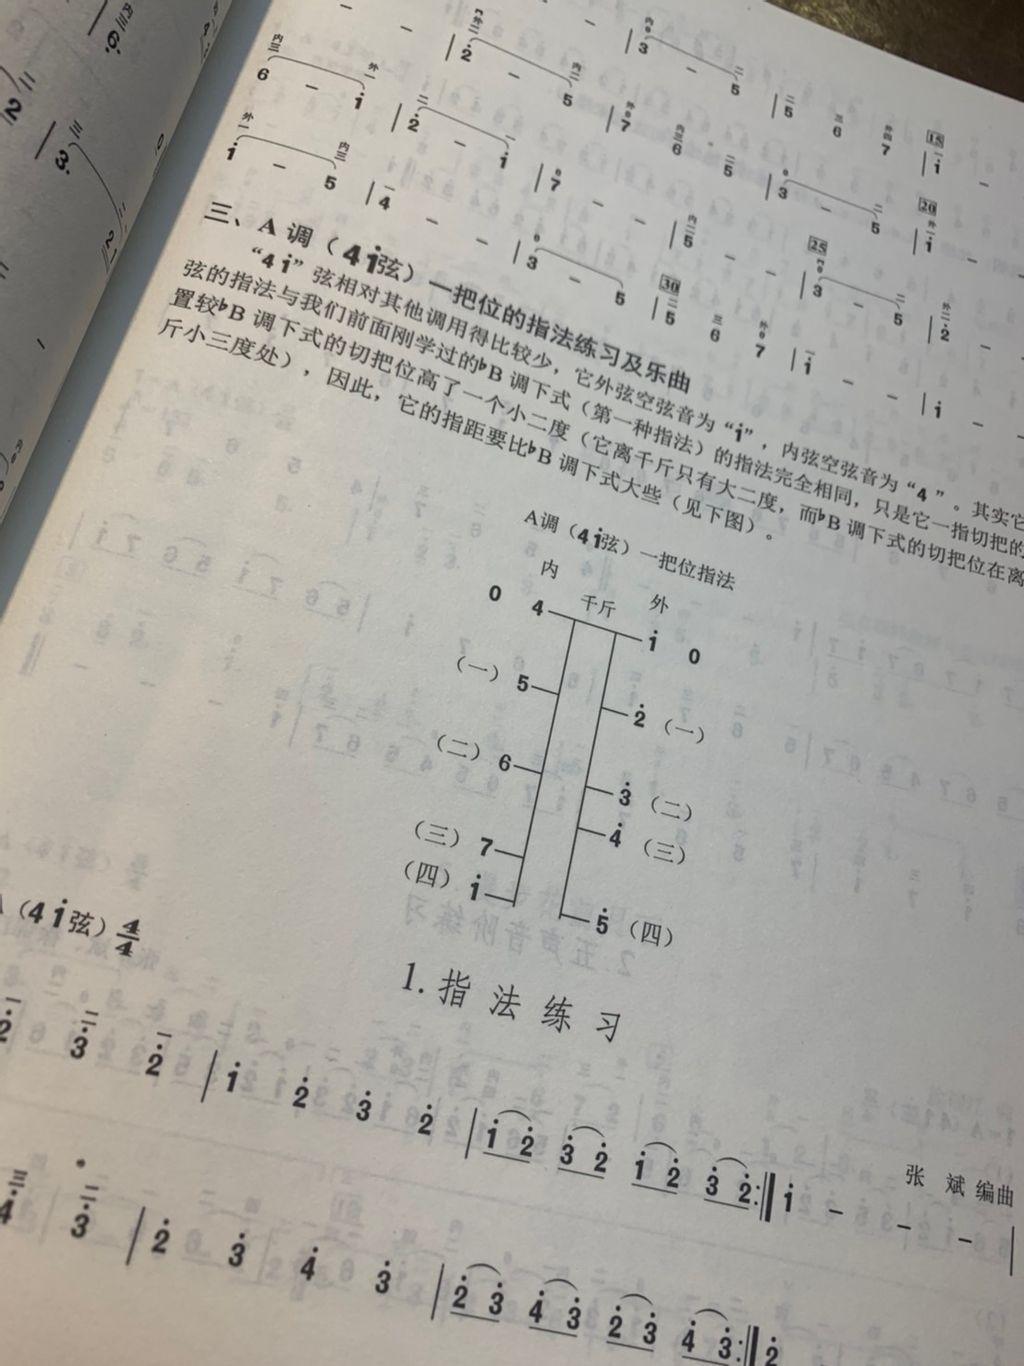 1EDA5223-3BD8-4F48-98AB-02E019D76EBC.jpeg